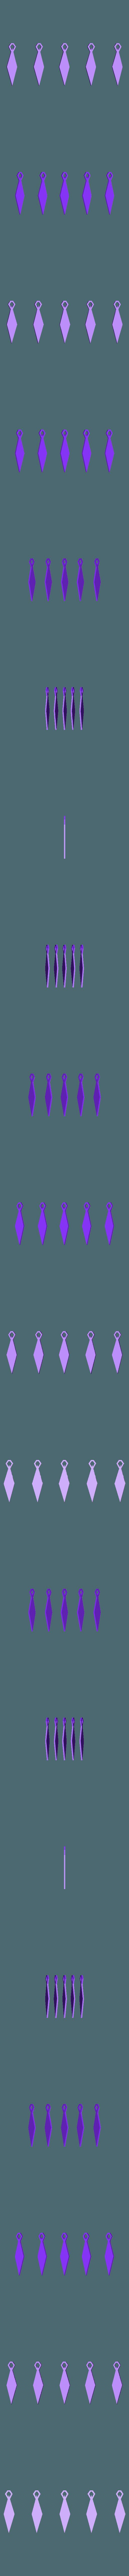 Element Pendants All Backs.stl Download STL file Element Pendants (Frozen 2) • 3D printable object, abbymath